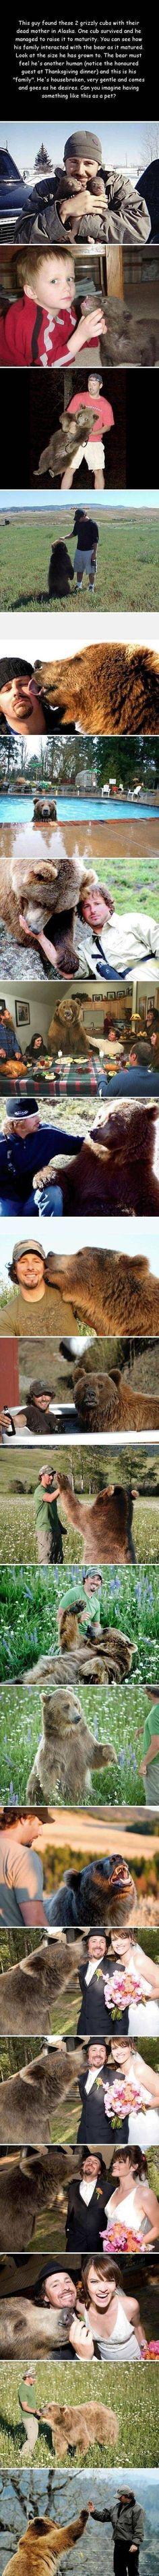 HUMOR STORY : A beary cute story